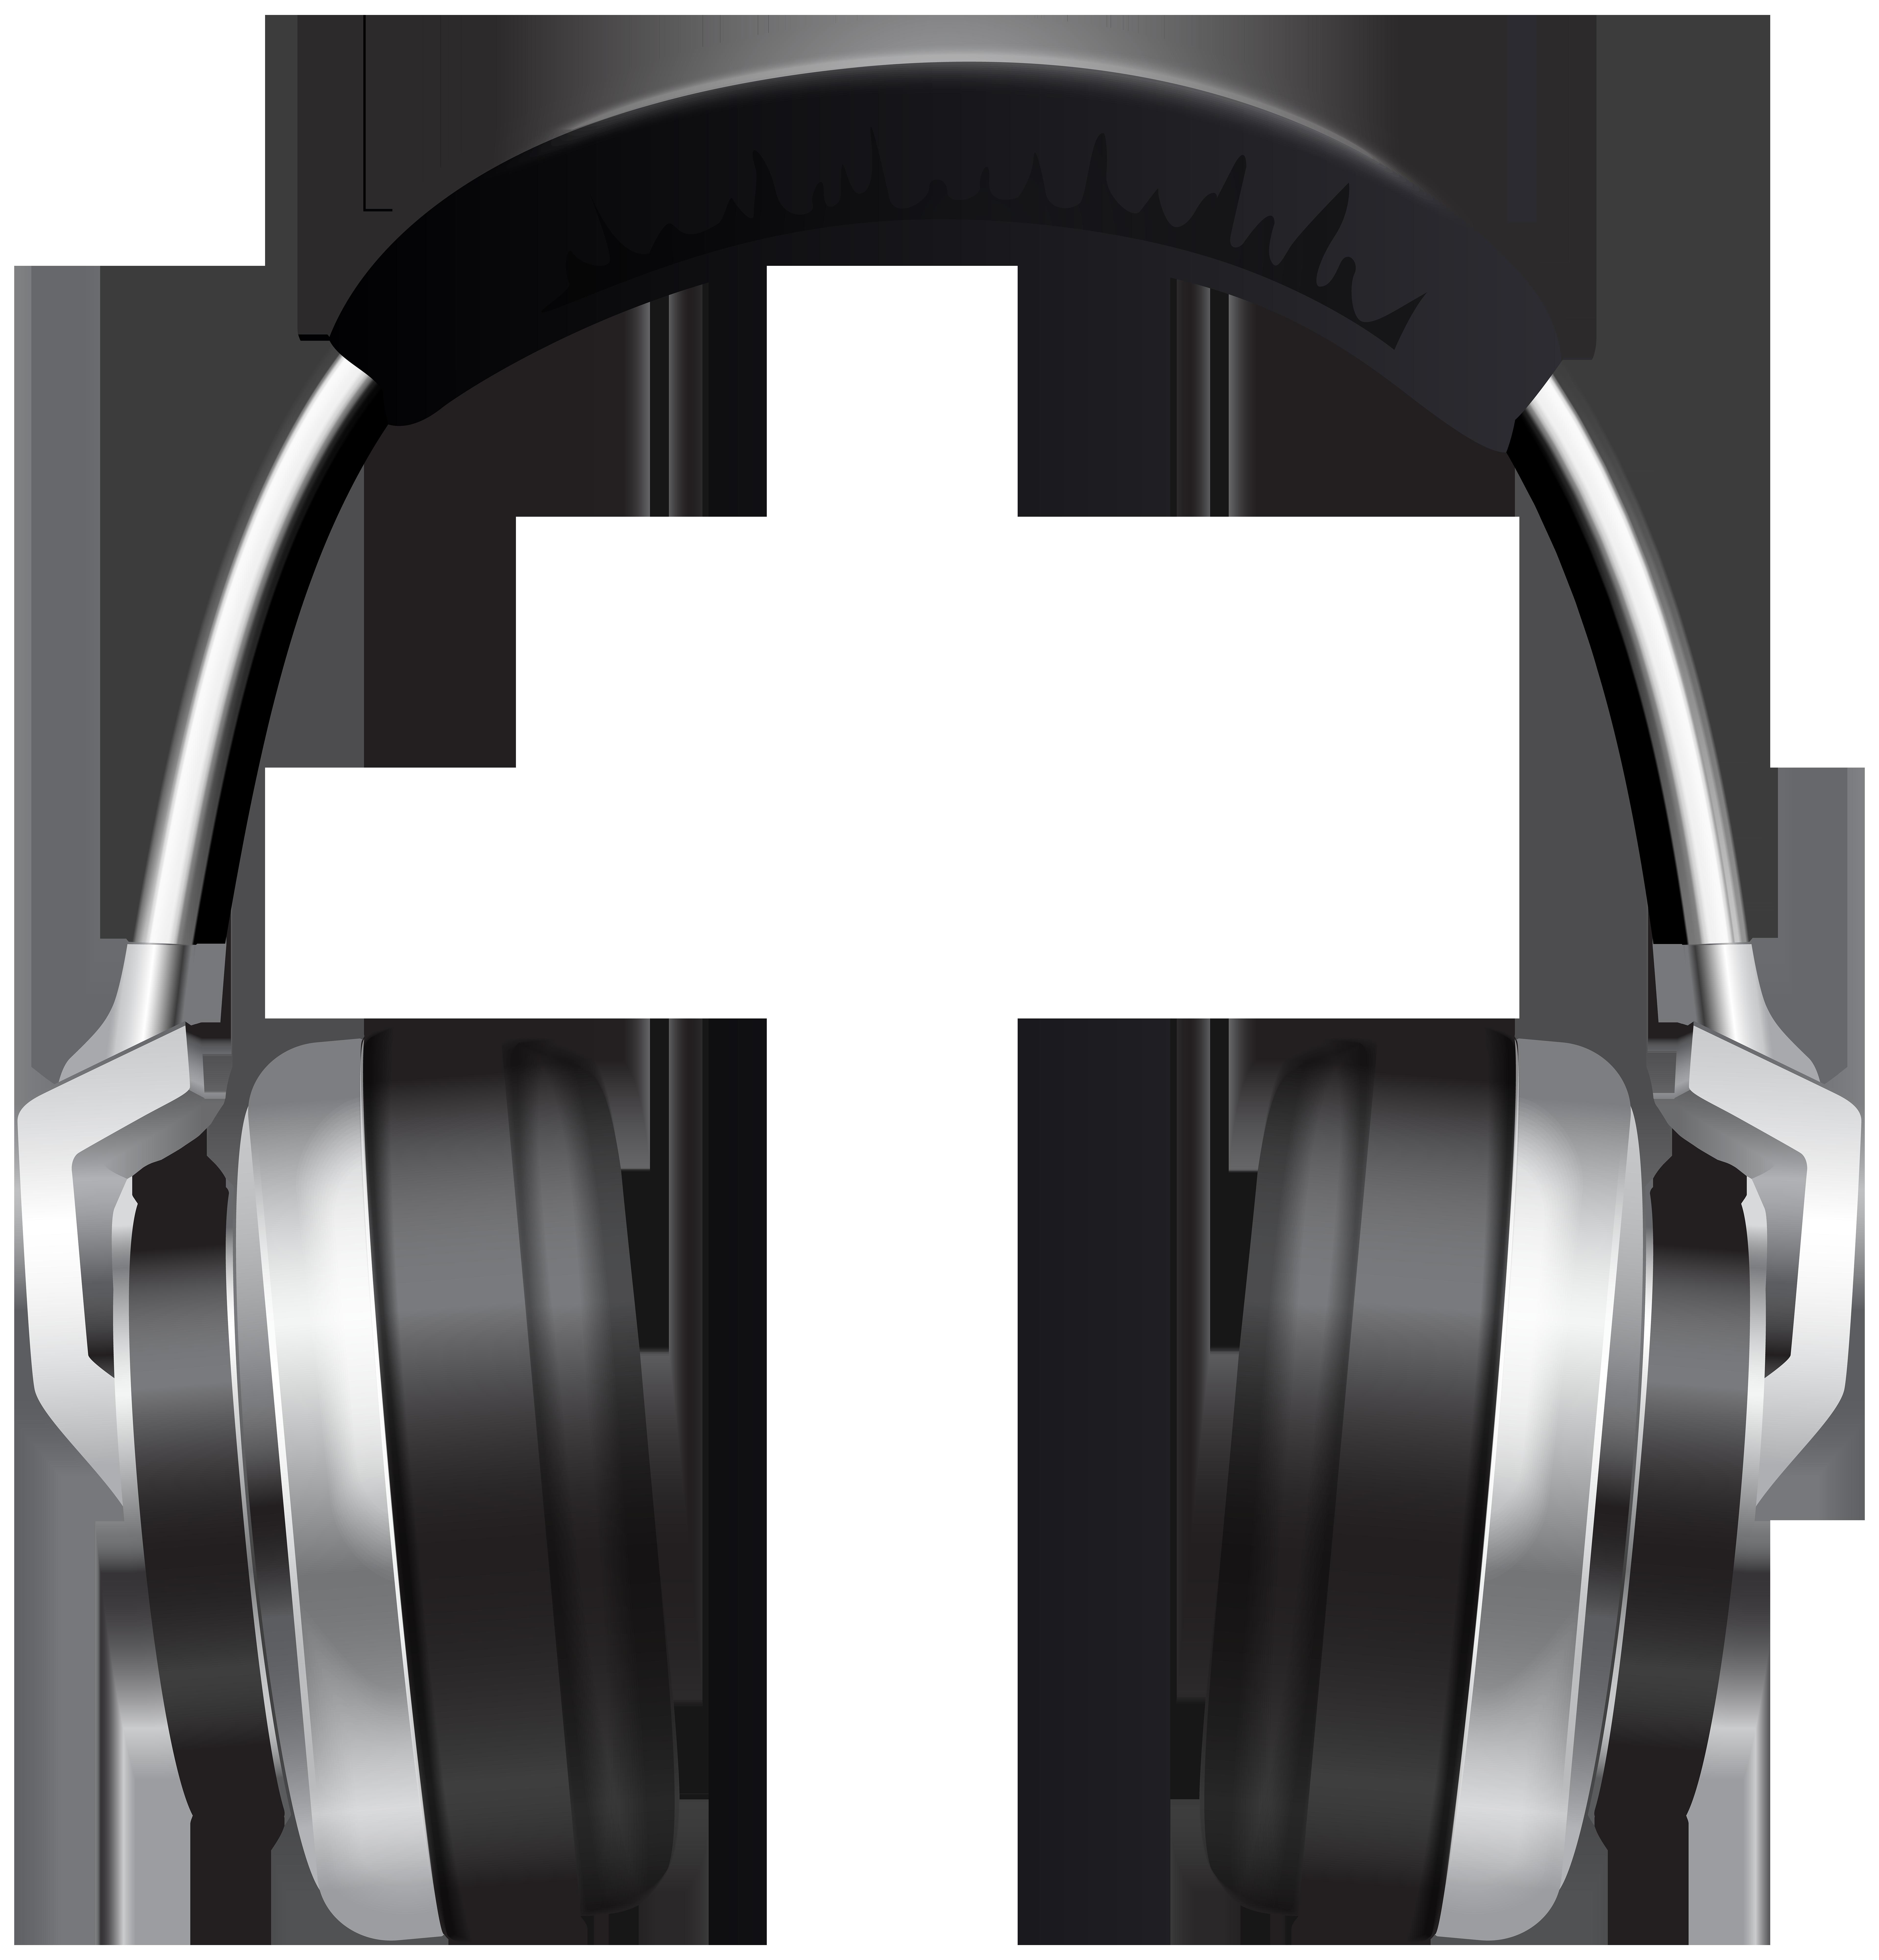 Headset Transparent PNG Clip Art Image.